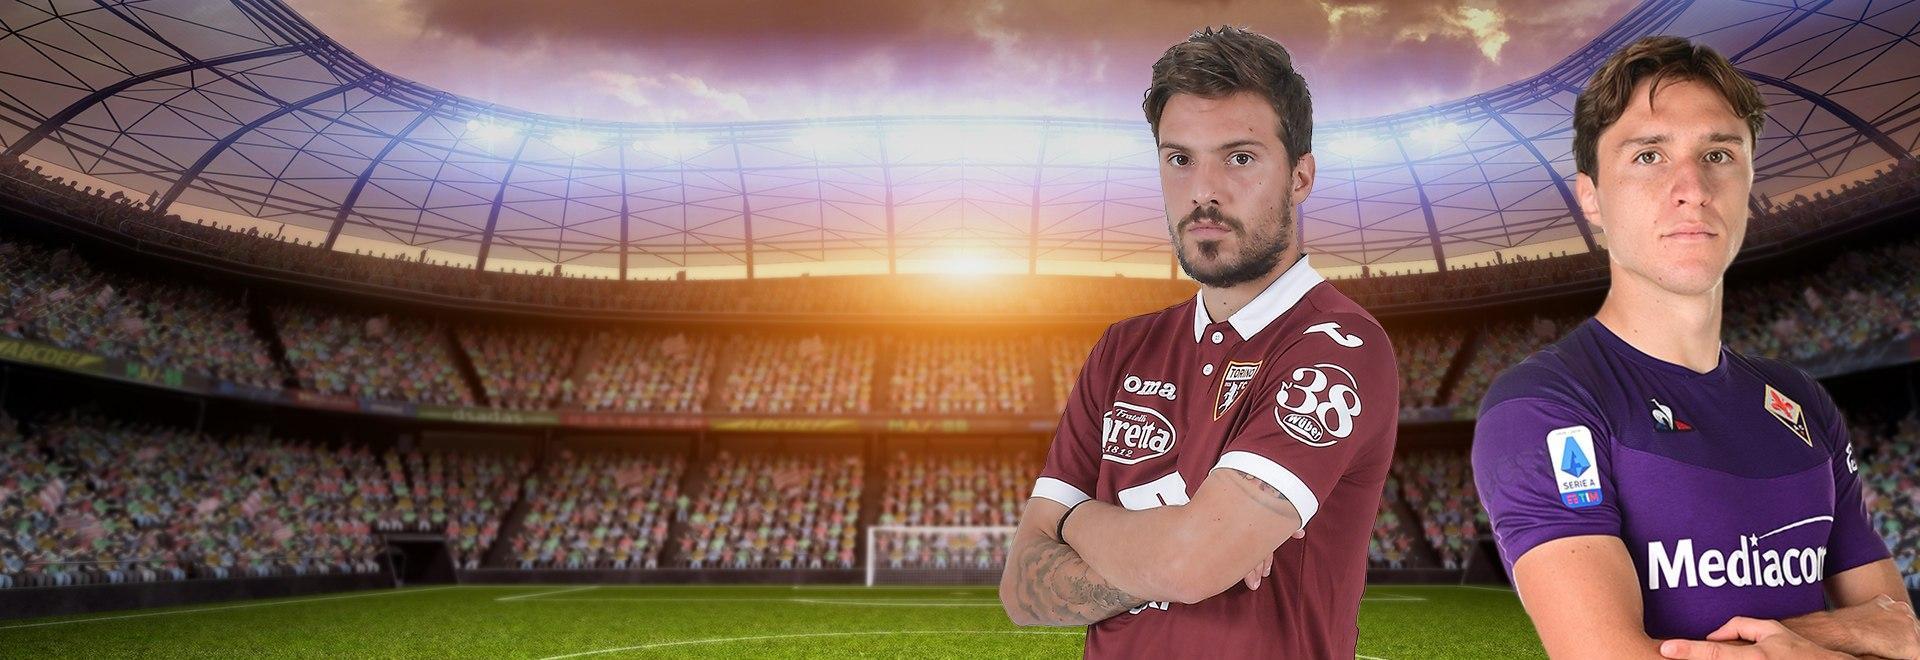 Torino - Fiorentina. 15a g.